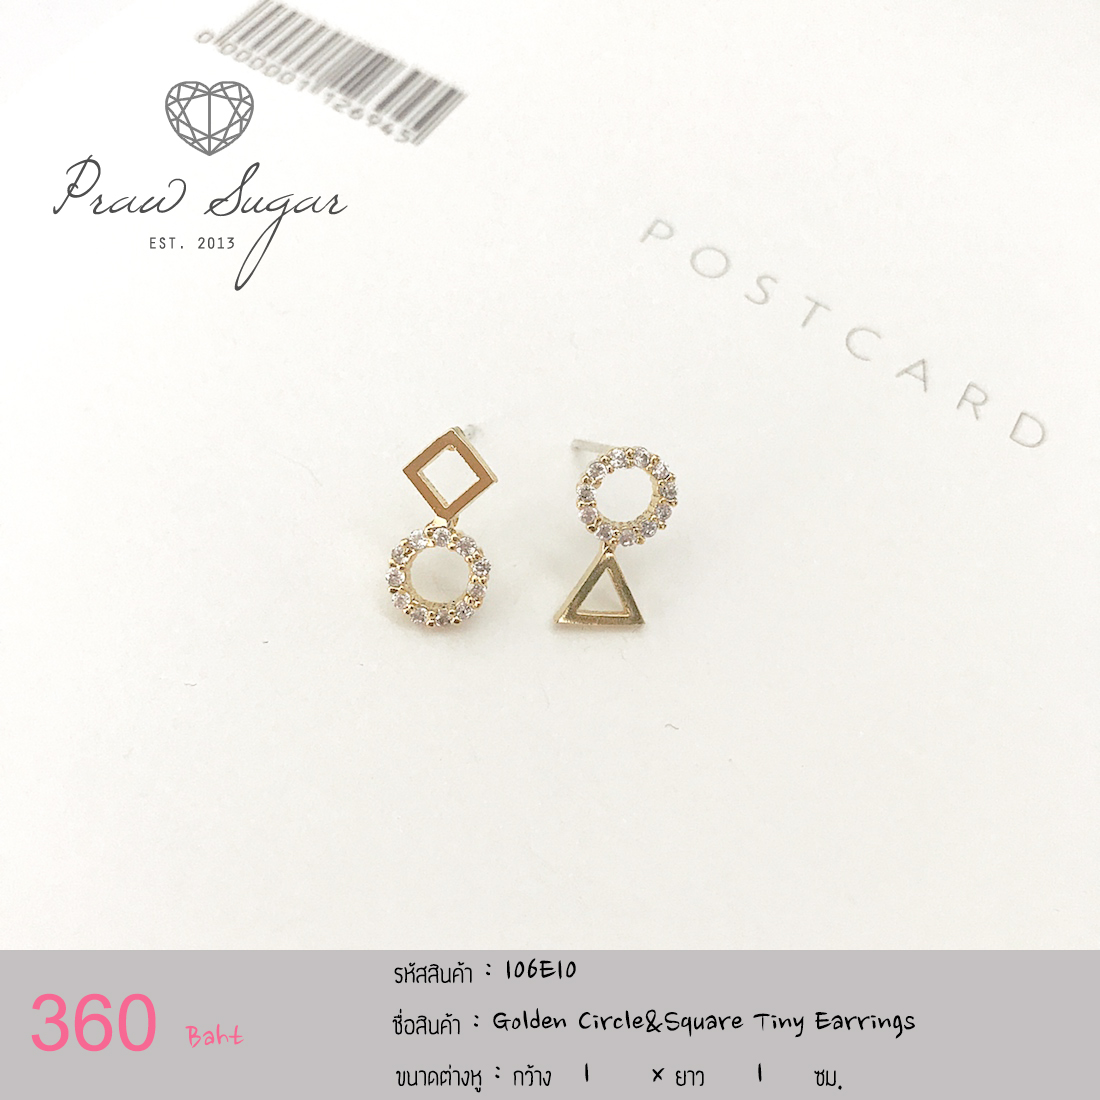 Golden Circle & Square Tiny Earrings (ตัวเรือนทำจากเงินแท้)